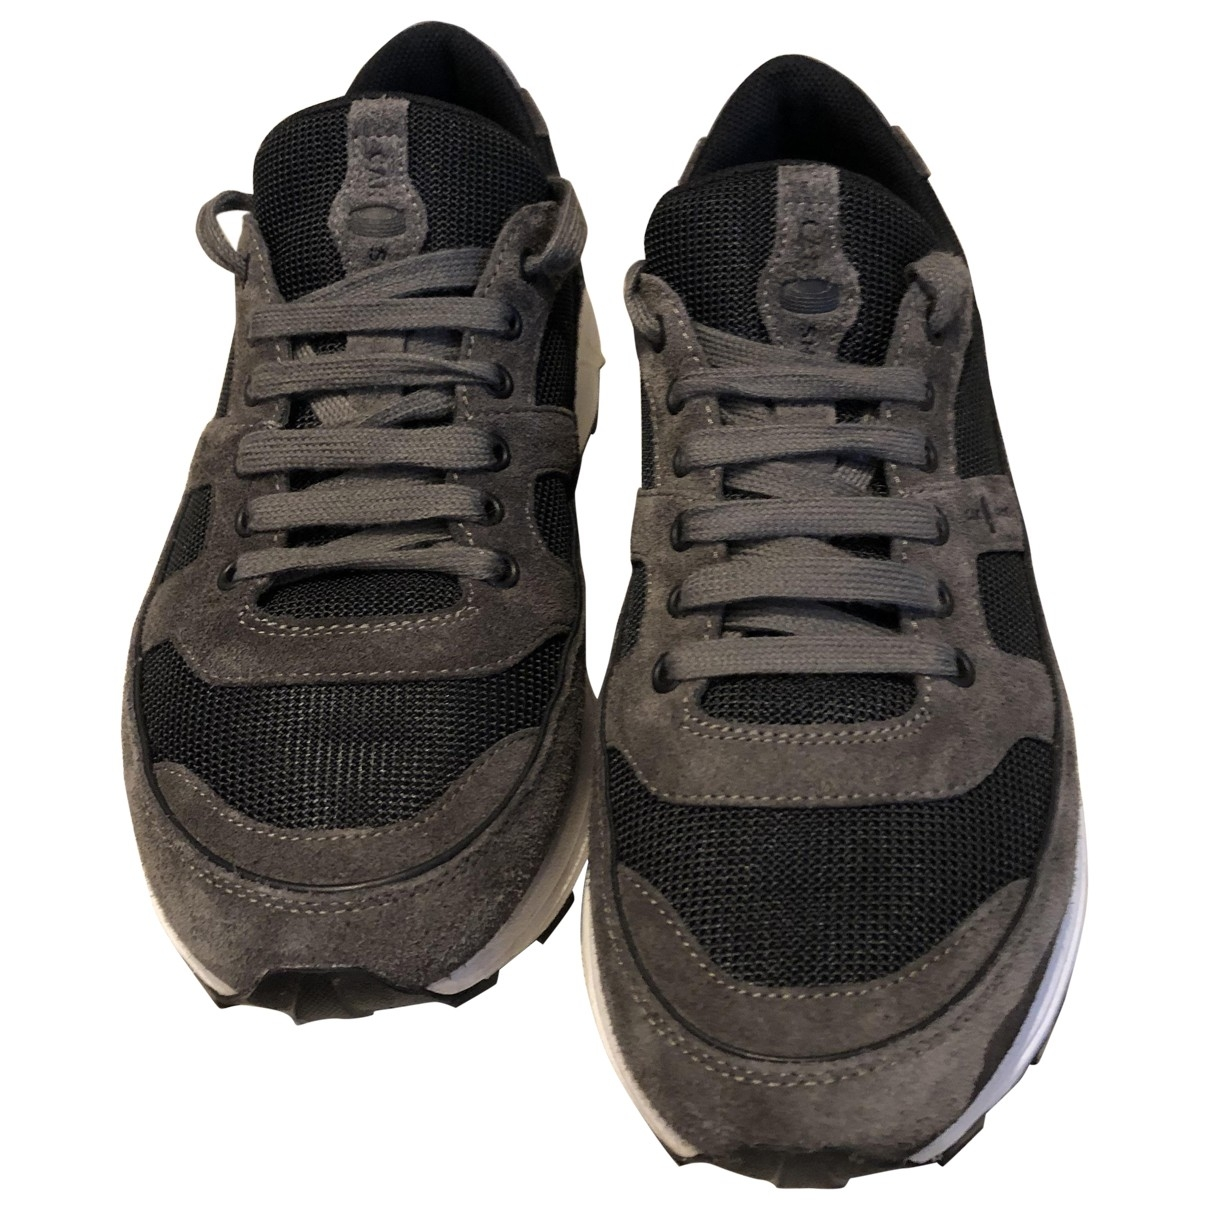 Carshoe \N Sneakers in  Anthrazit Veloursleder